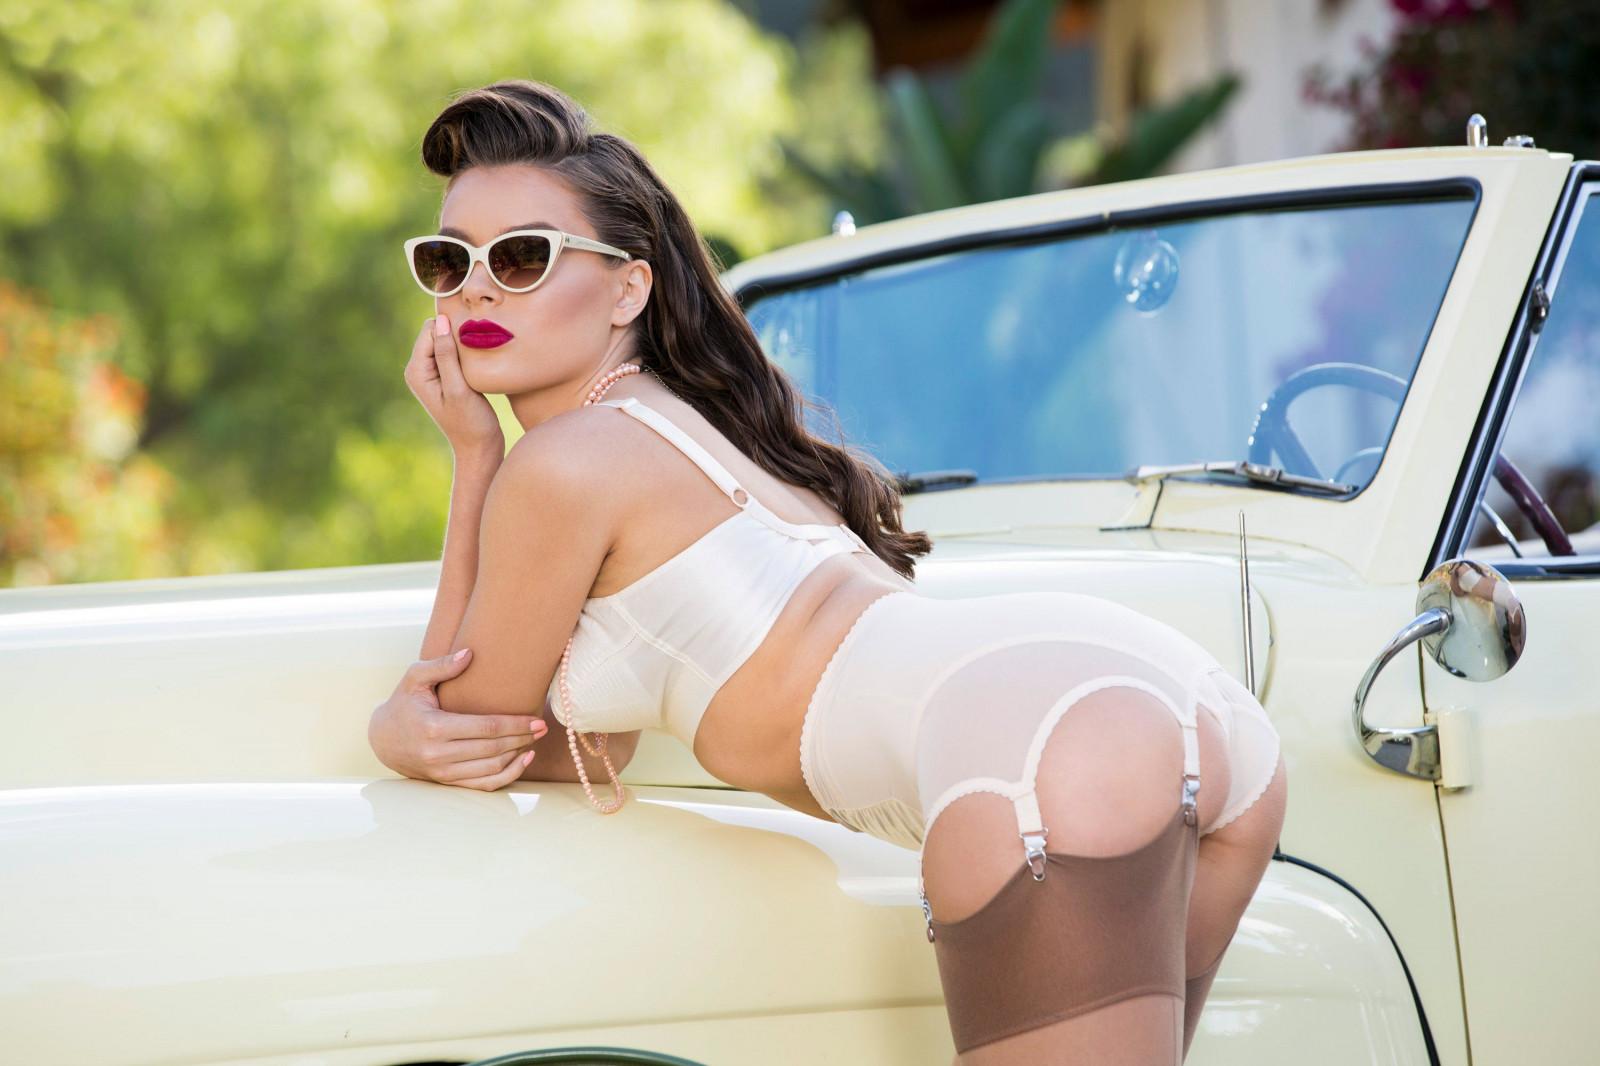 Lana rhoades car